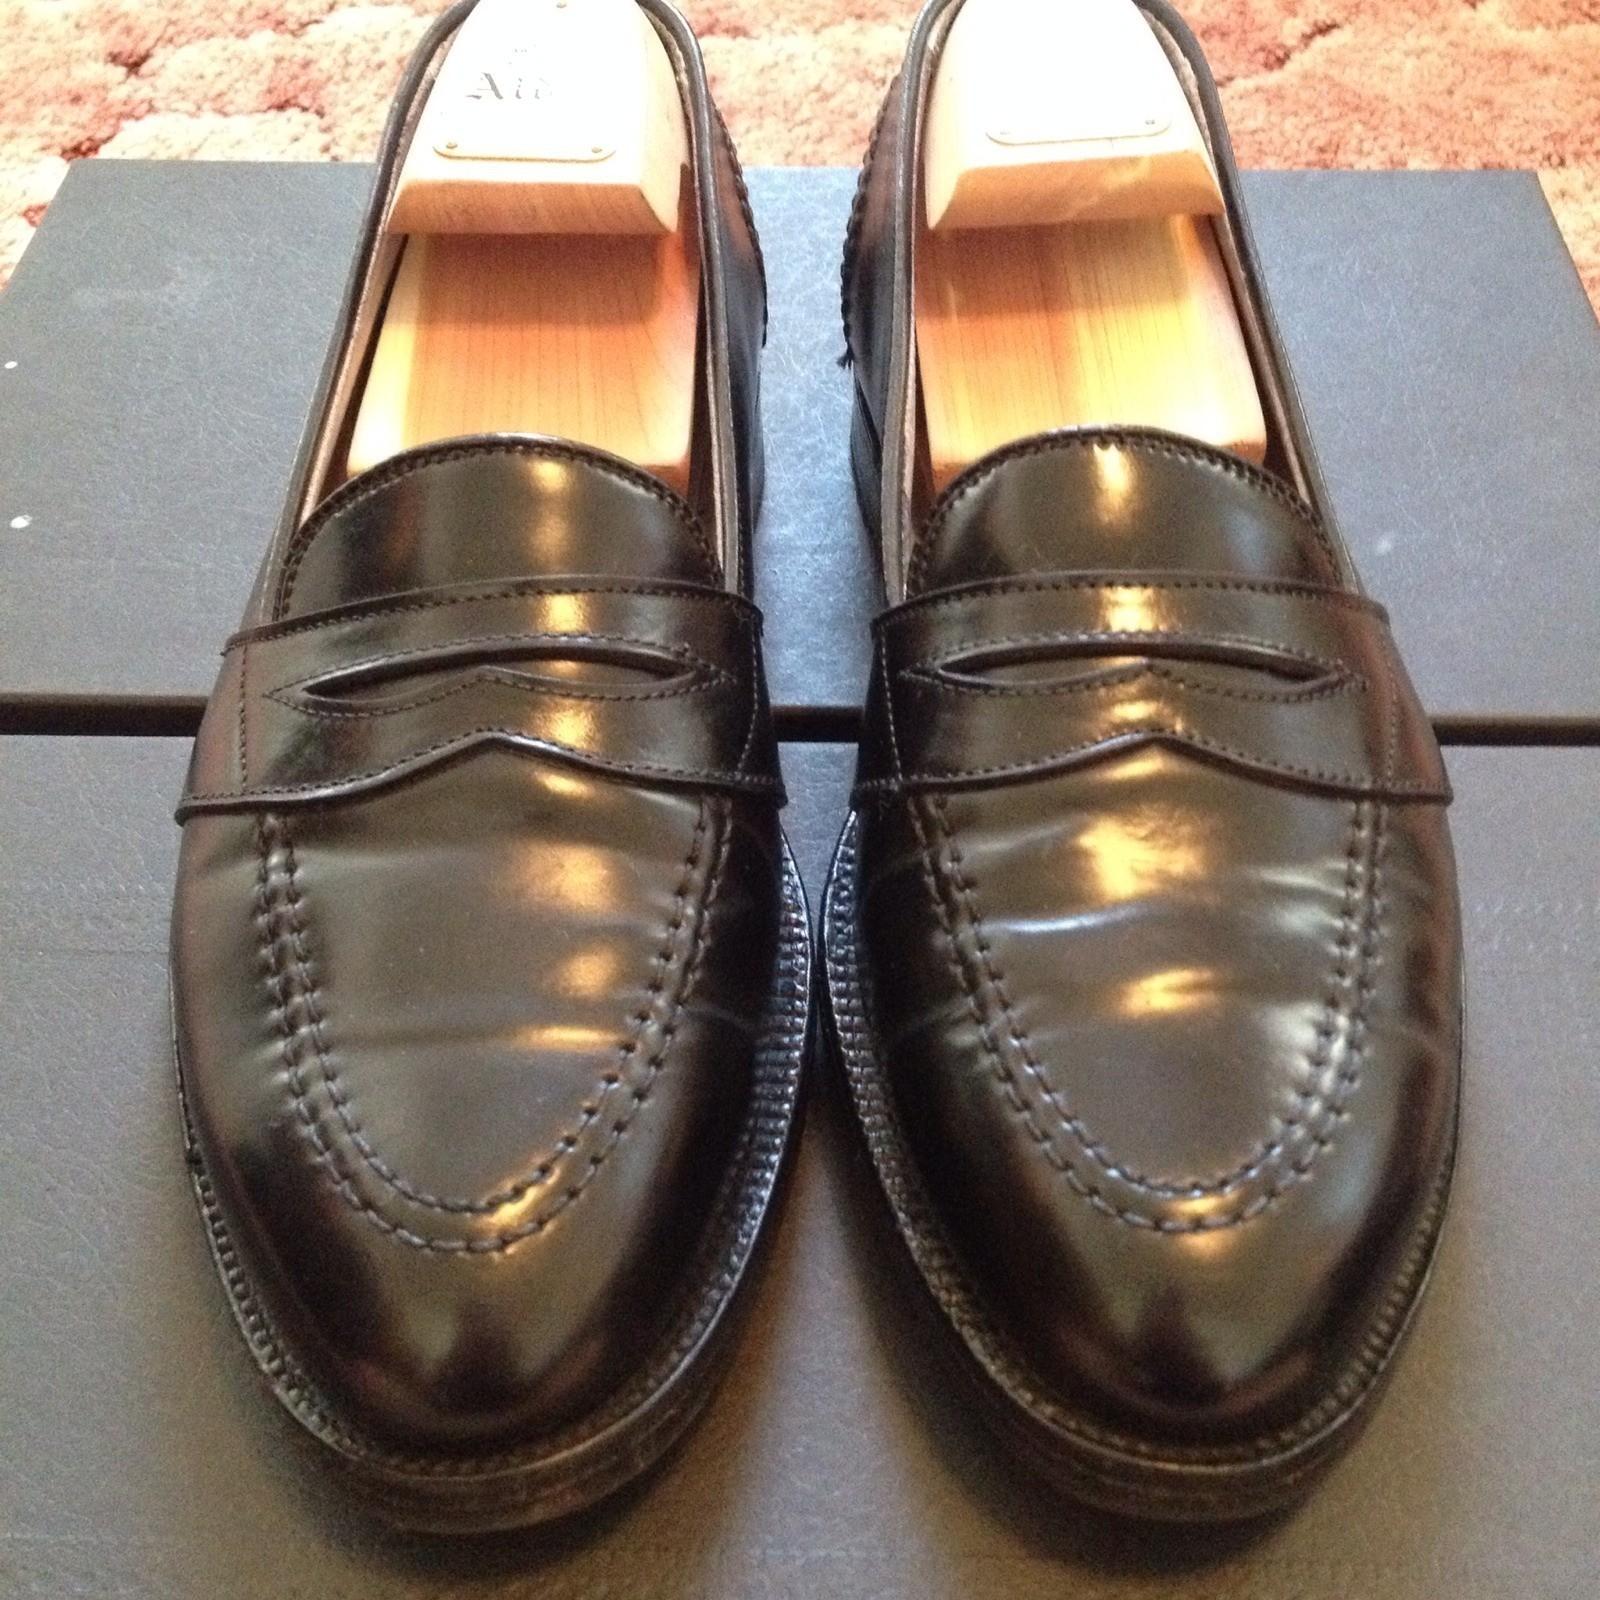 For sale alden 6845 black shell cordovan low vamp loafer sz 8c lnib